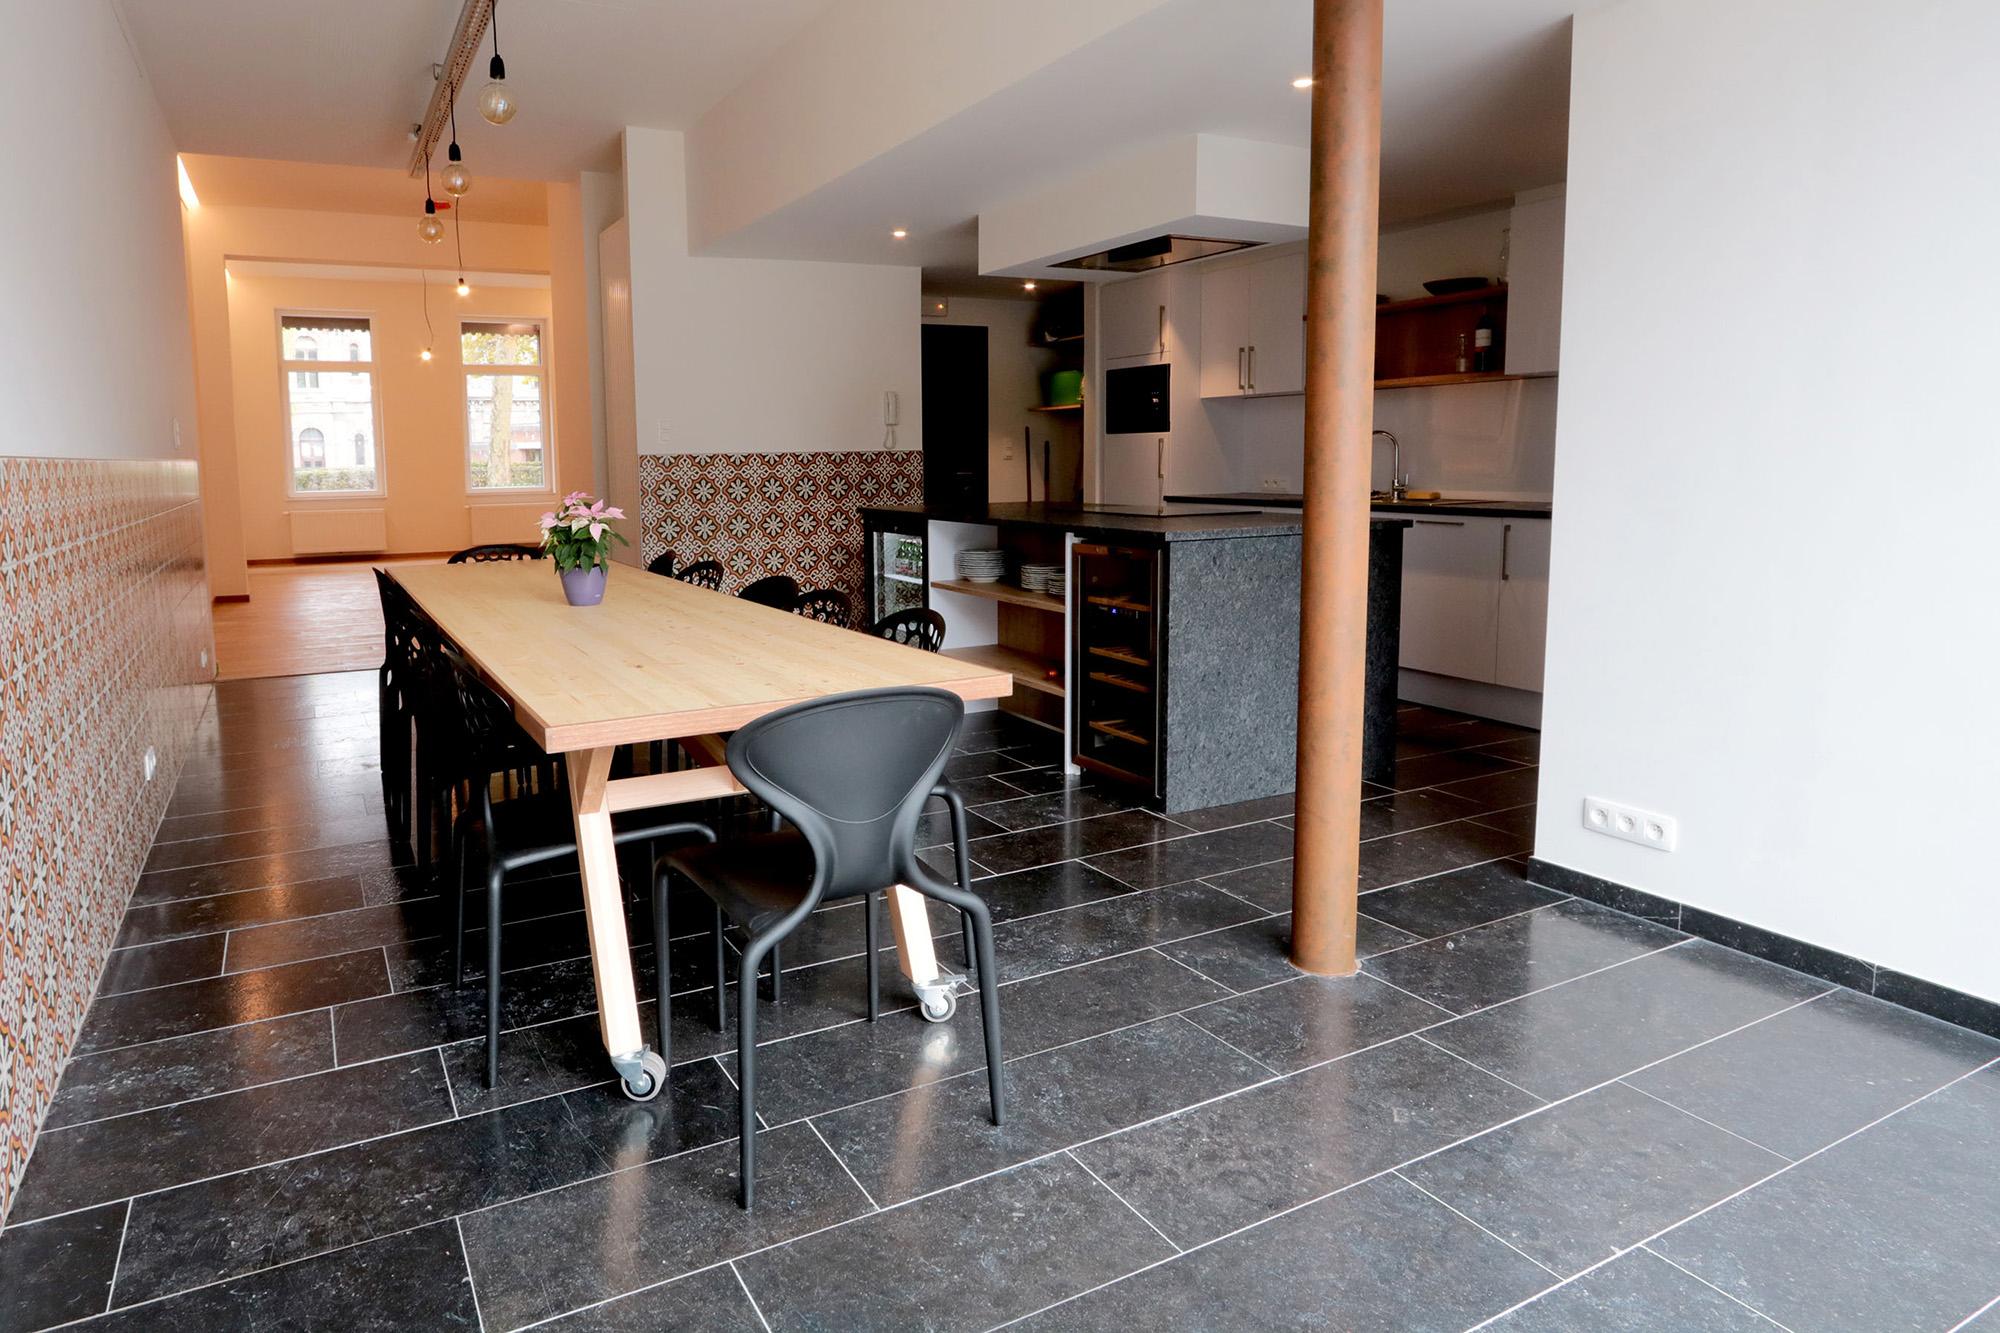 Belgian Blue stone - Floor tiles - Natural stone - Tiles Patinato - brushed